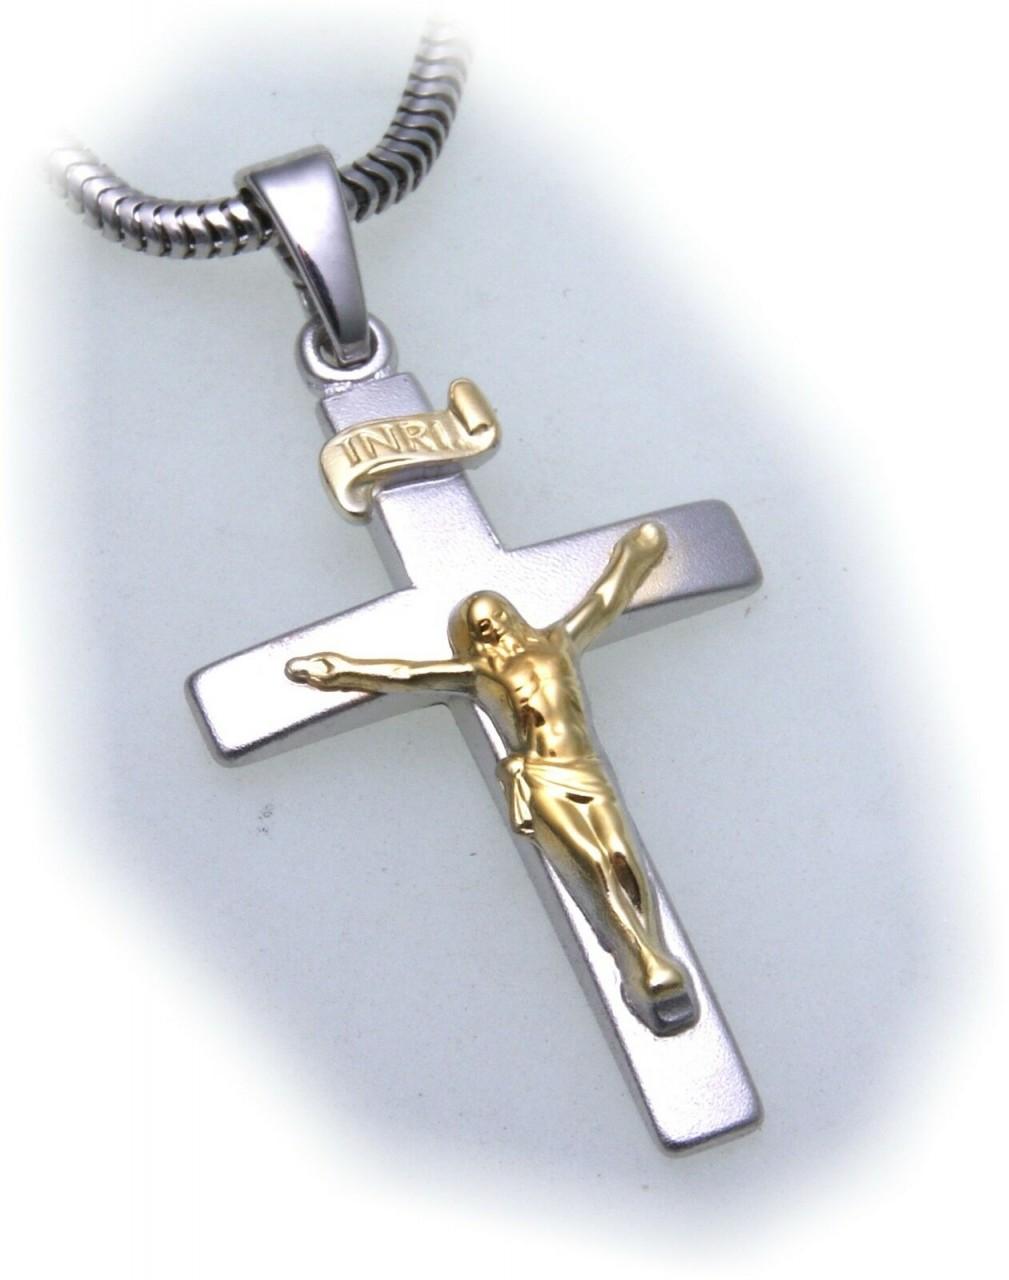 Anhänger Kreuz mit Jesus echt Silber 925 teilvergoldet 31 Sterlingsilber Unisex